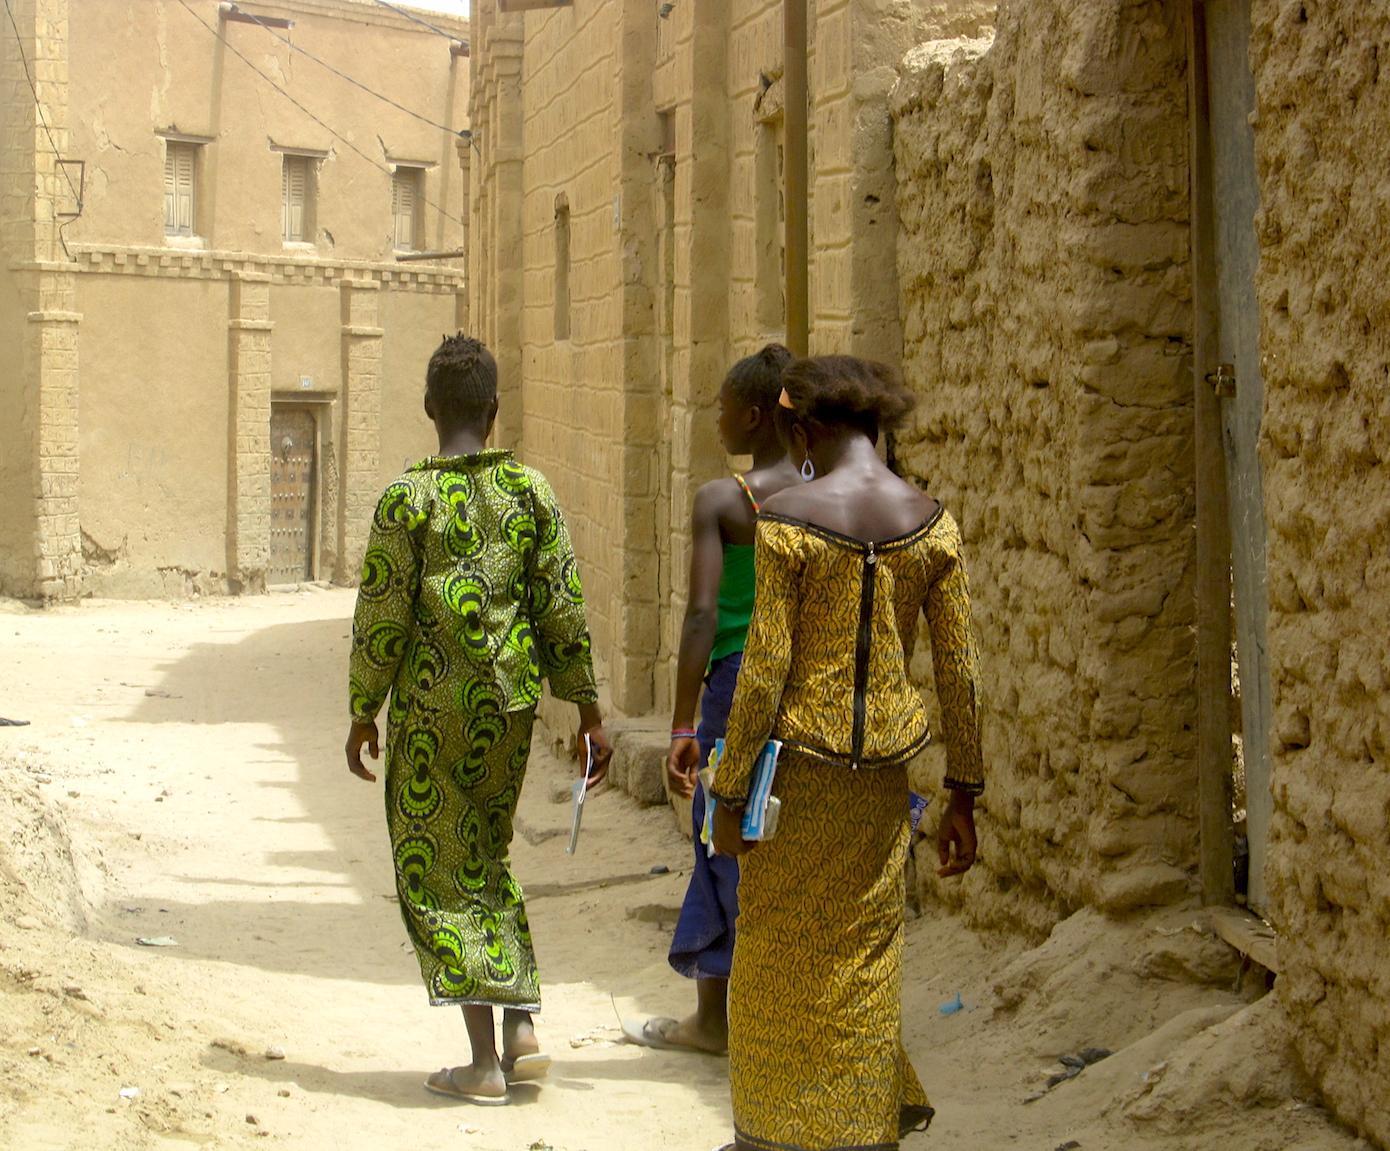 Girls going to school in Timbuktu. Photo: Patti Neves